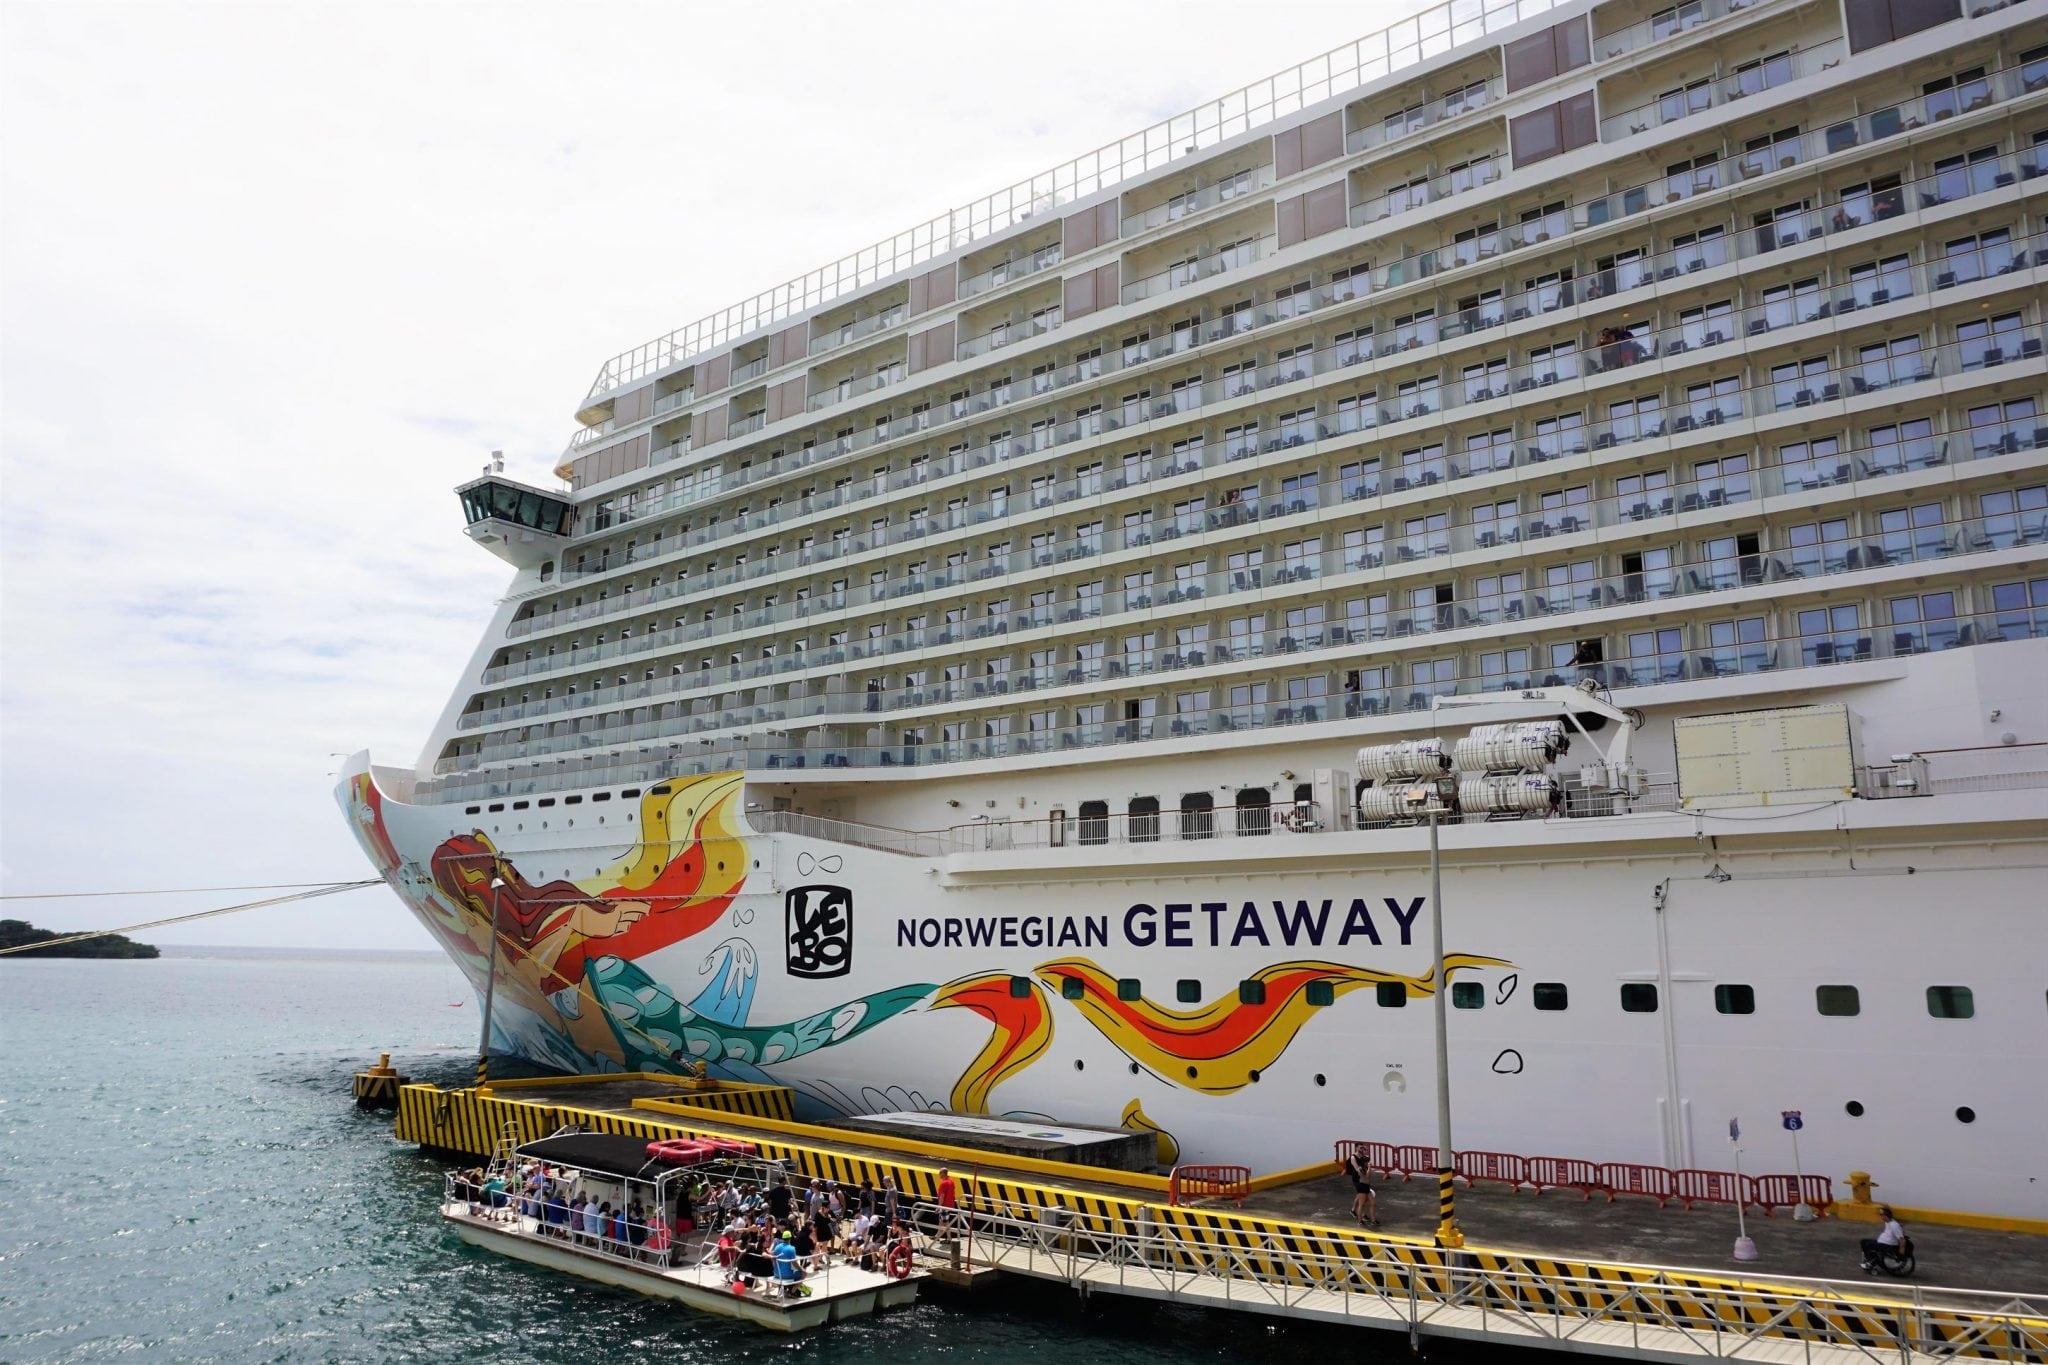 Norwegian Getaway Ship Scorecard